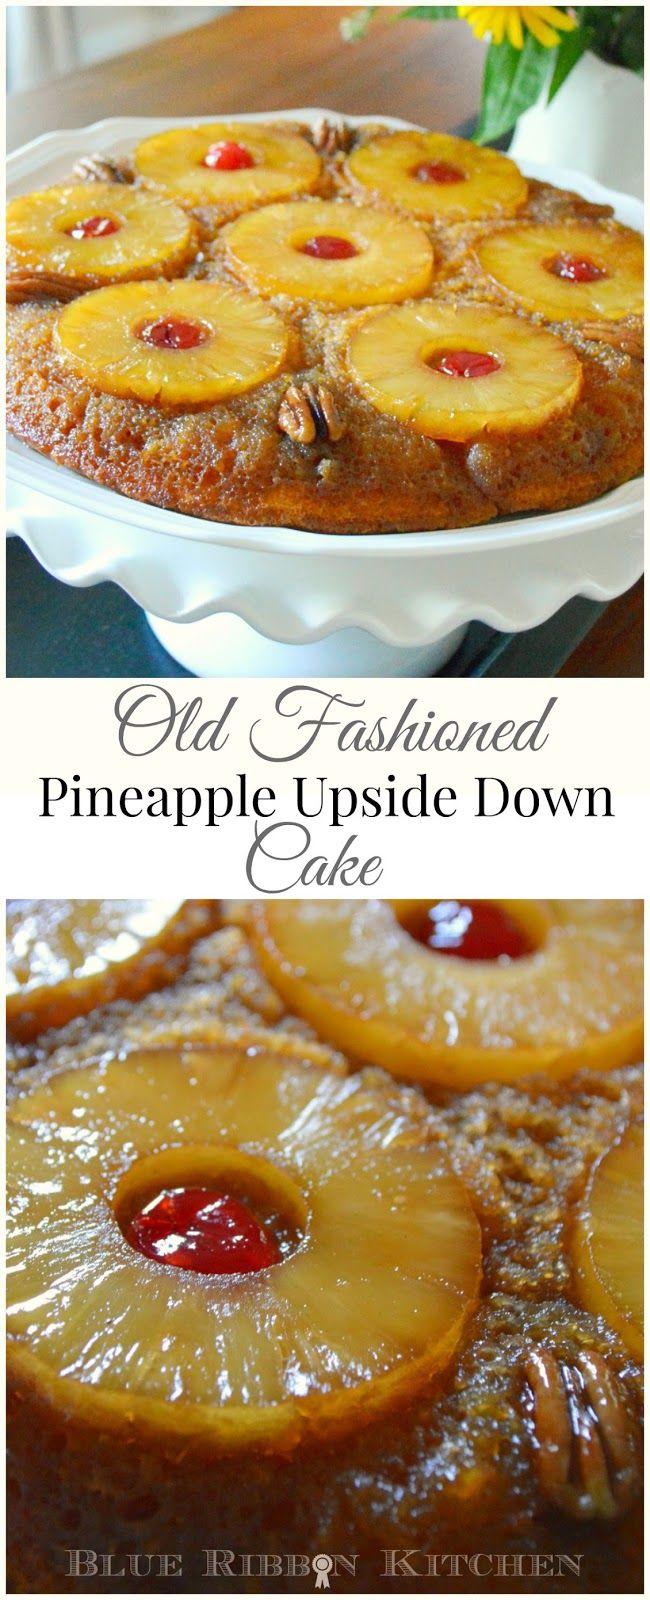 recipe: dole recipes pineapple upside down cake [23]